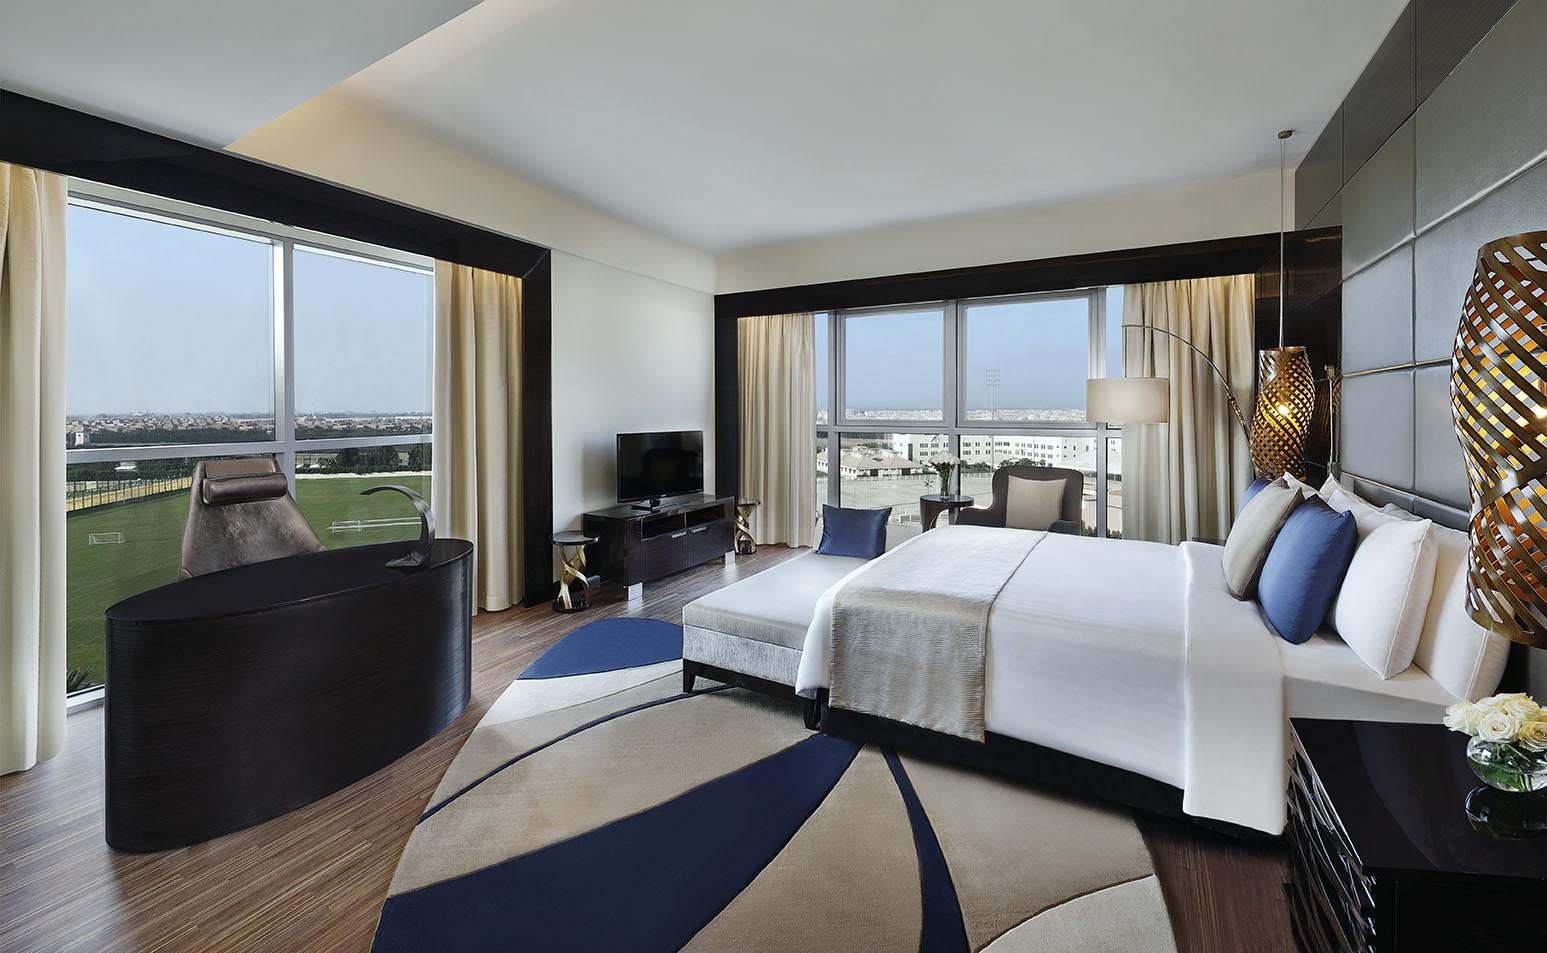 bed up prix prix d un lit escamotable prix lit escamotable plafond literie prix lit escamotable. Black Bedroom Furniture Sets. Home Design Ideas